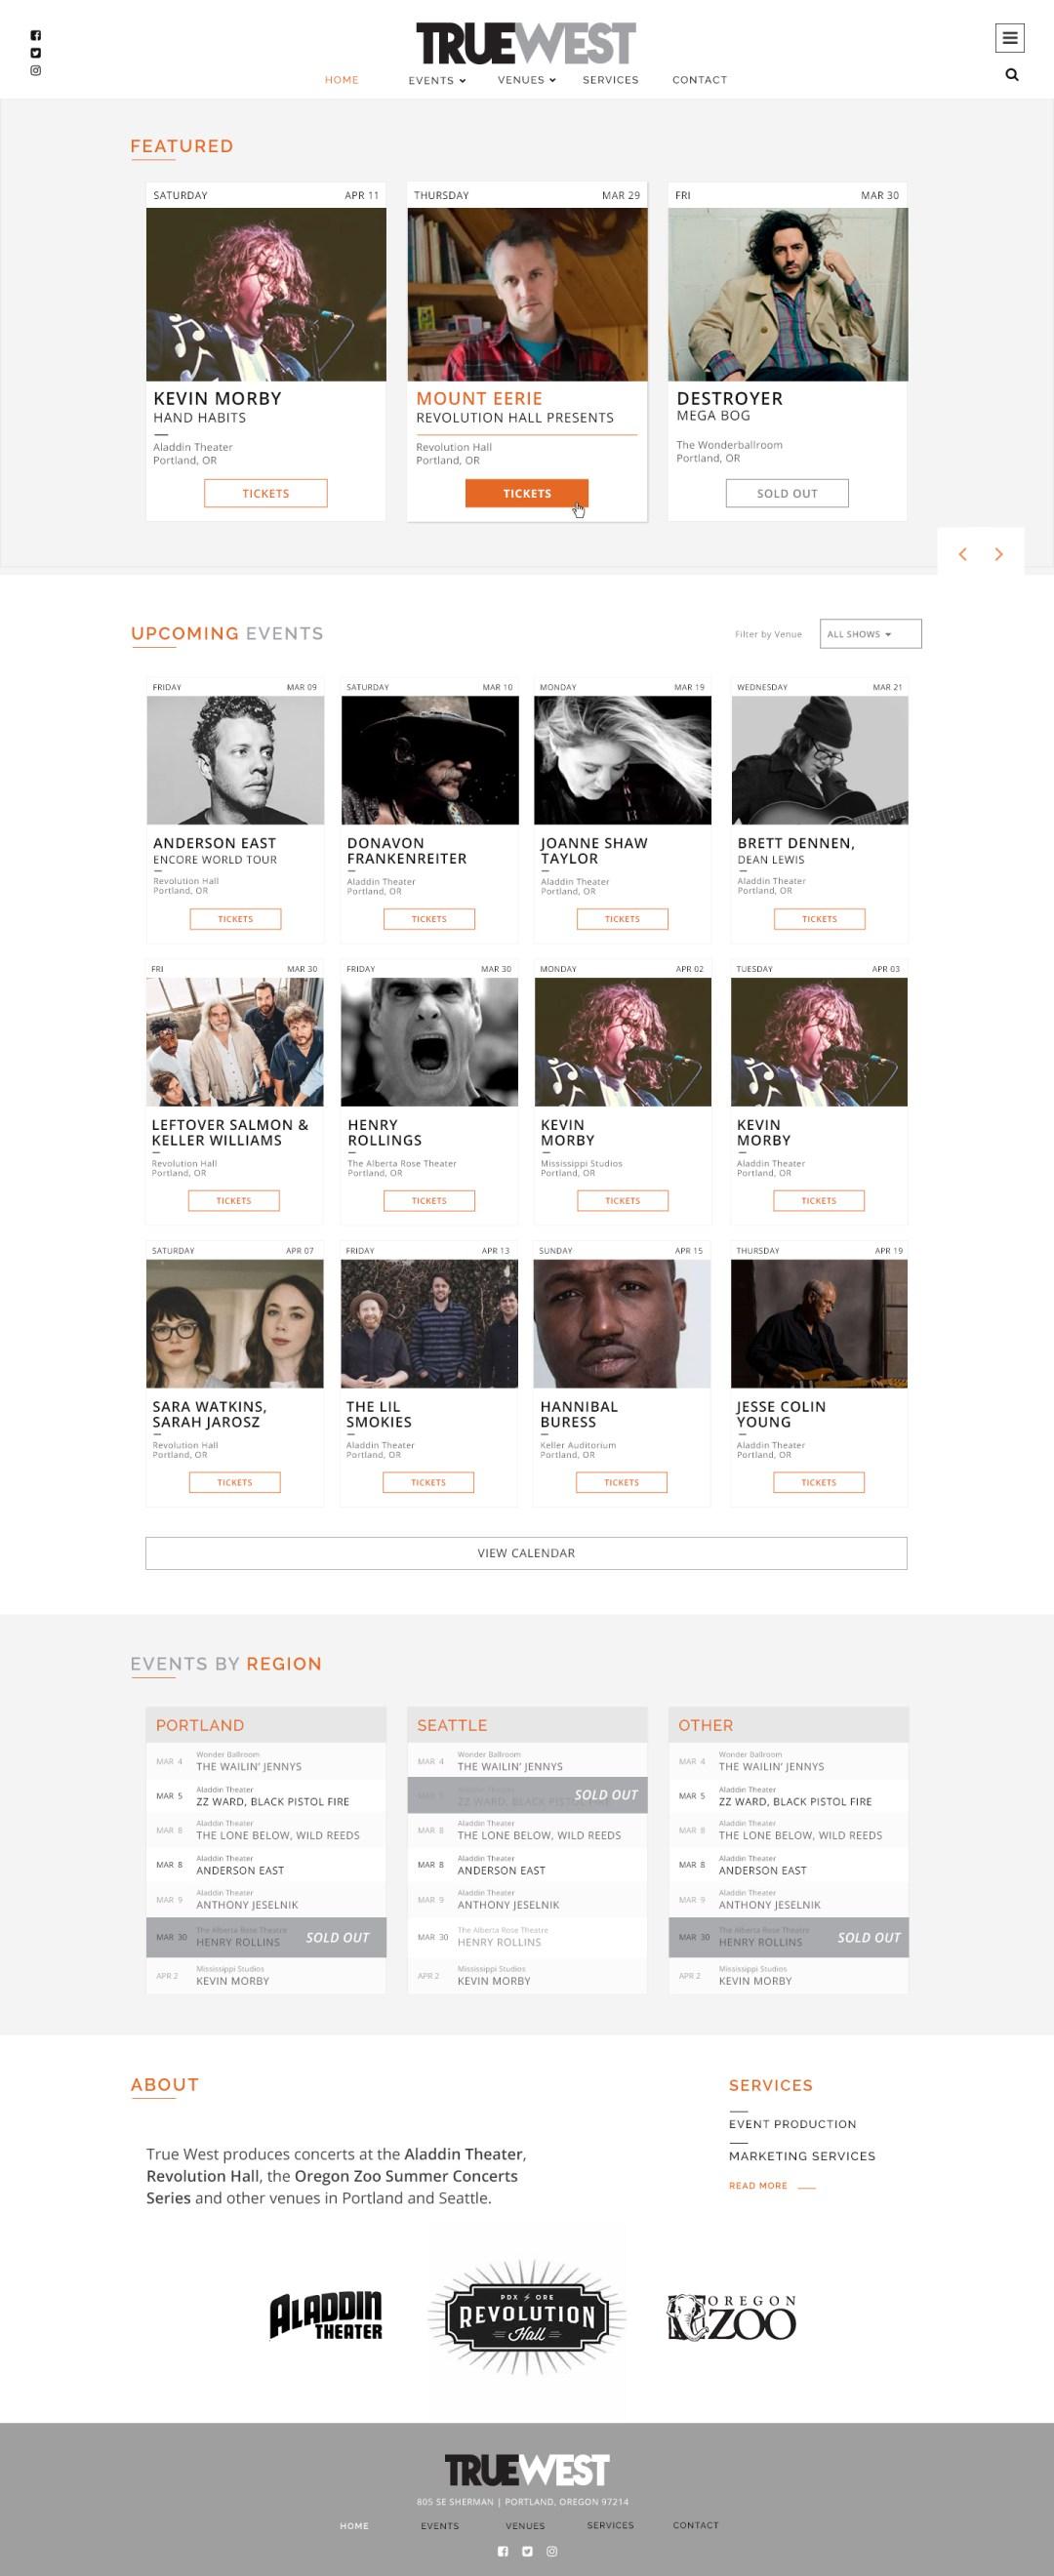 True West Presents - Home Page Design